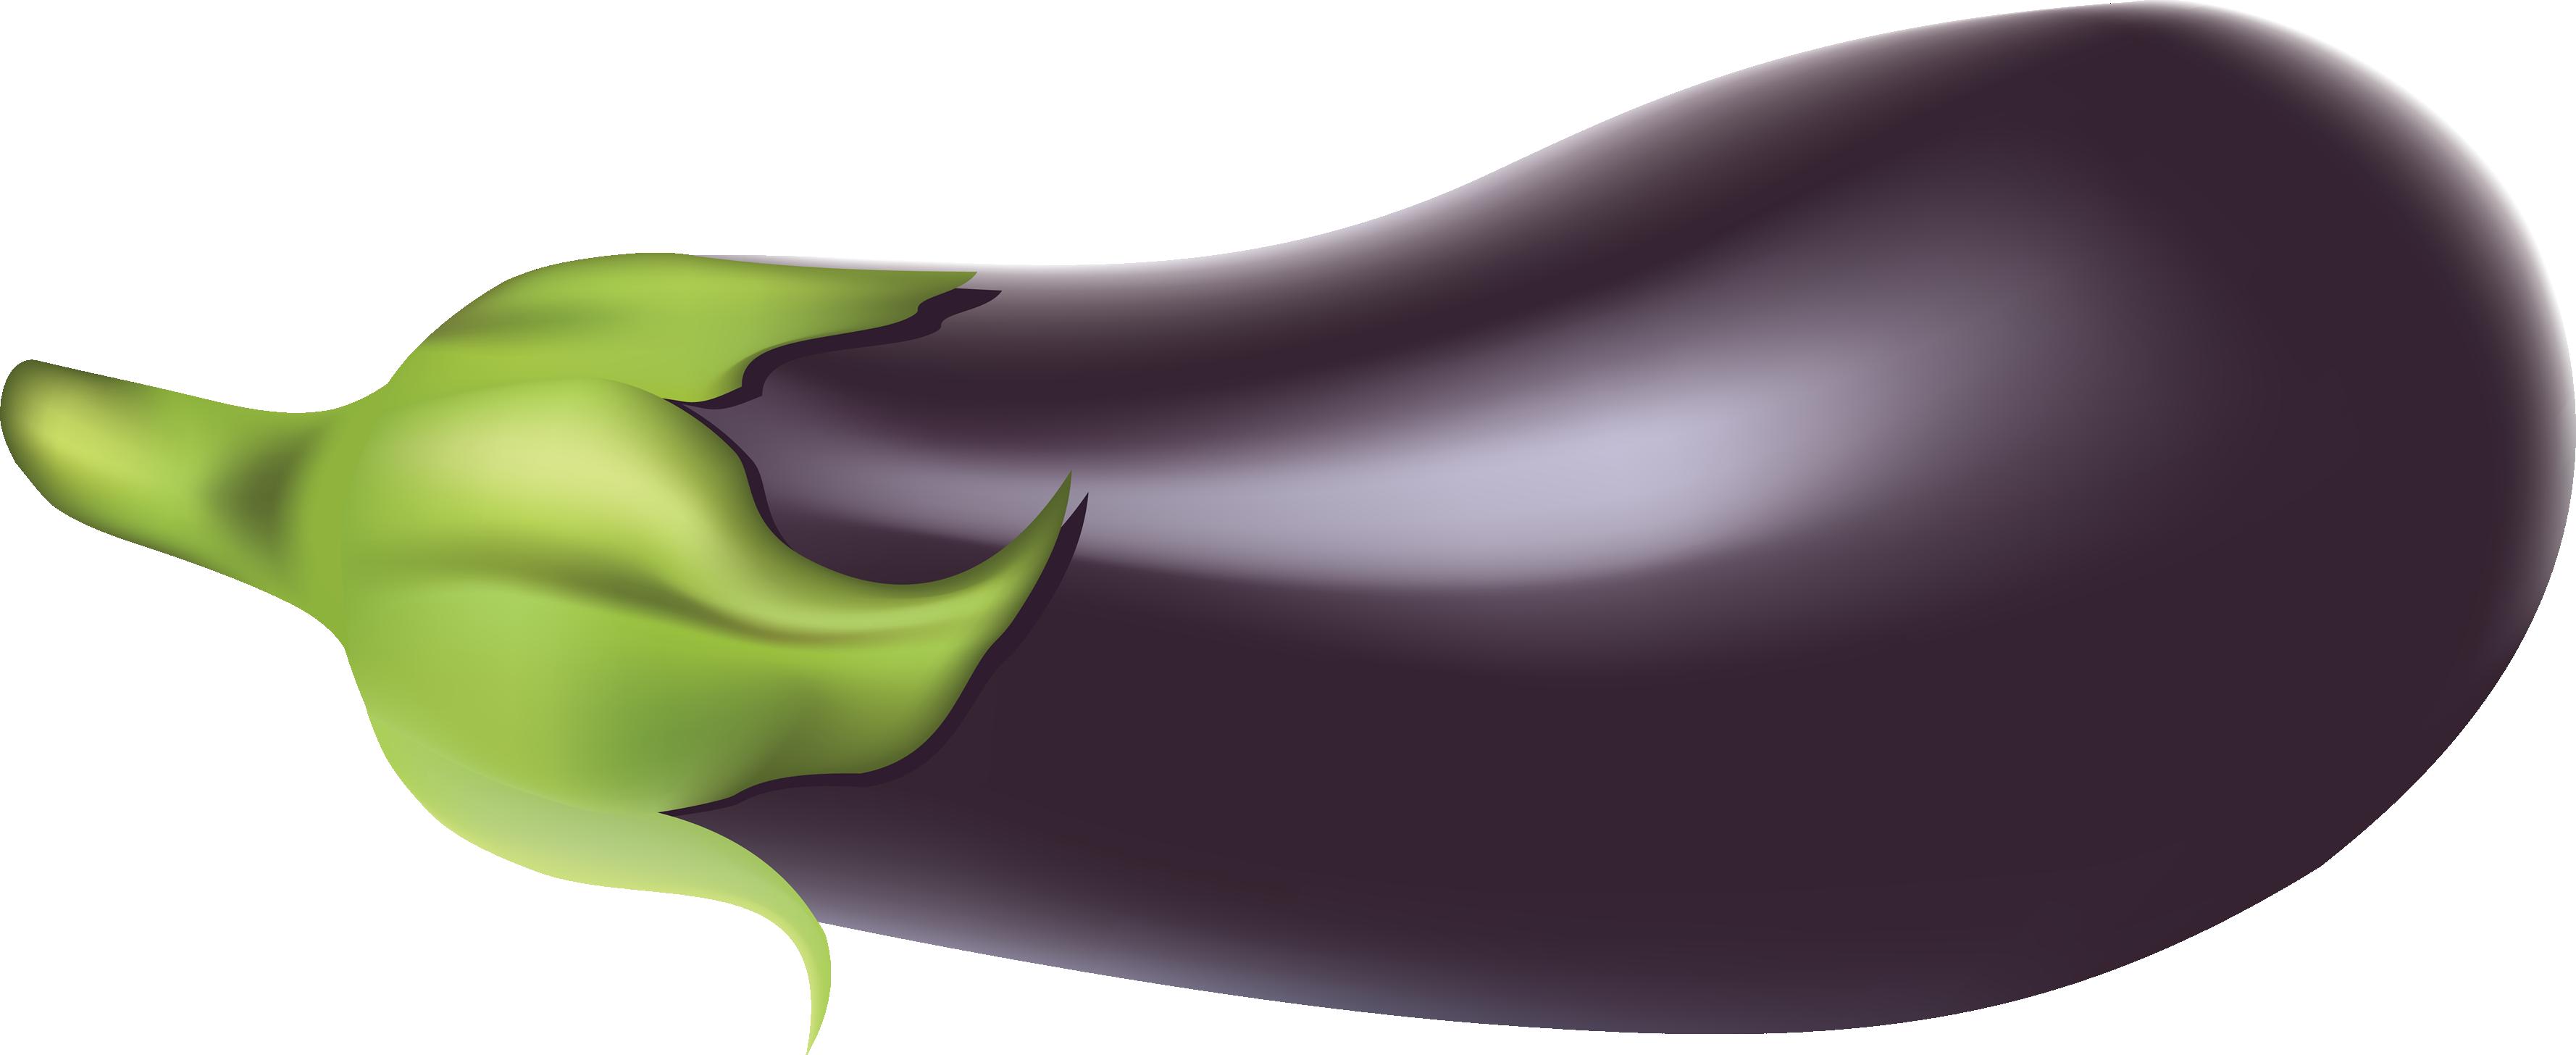 Vegetables free png images. Eggplant clipart single vegetable